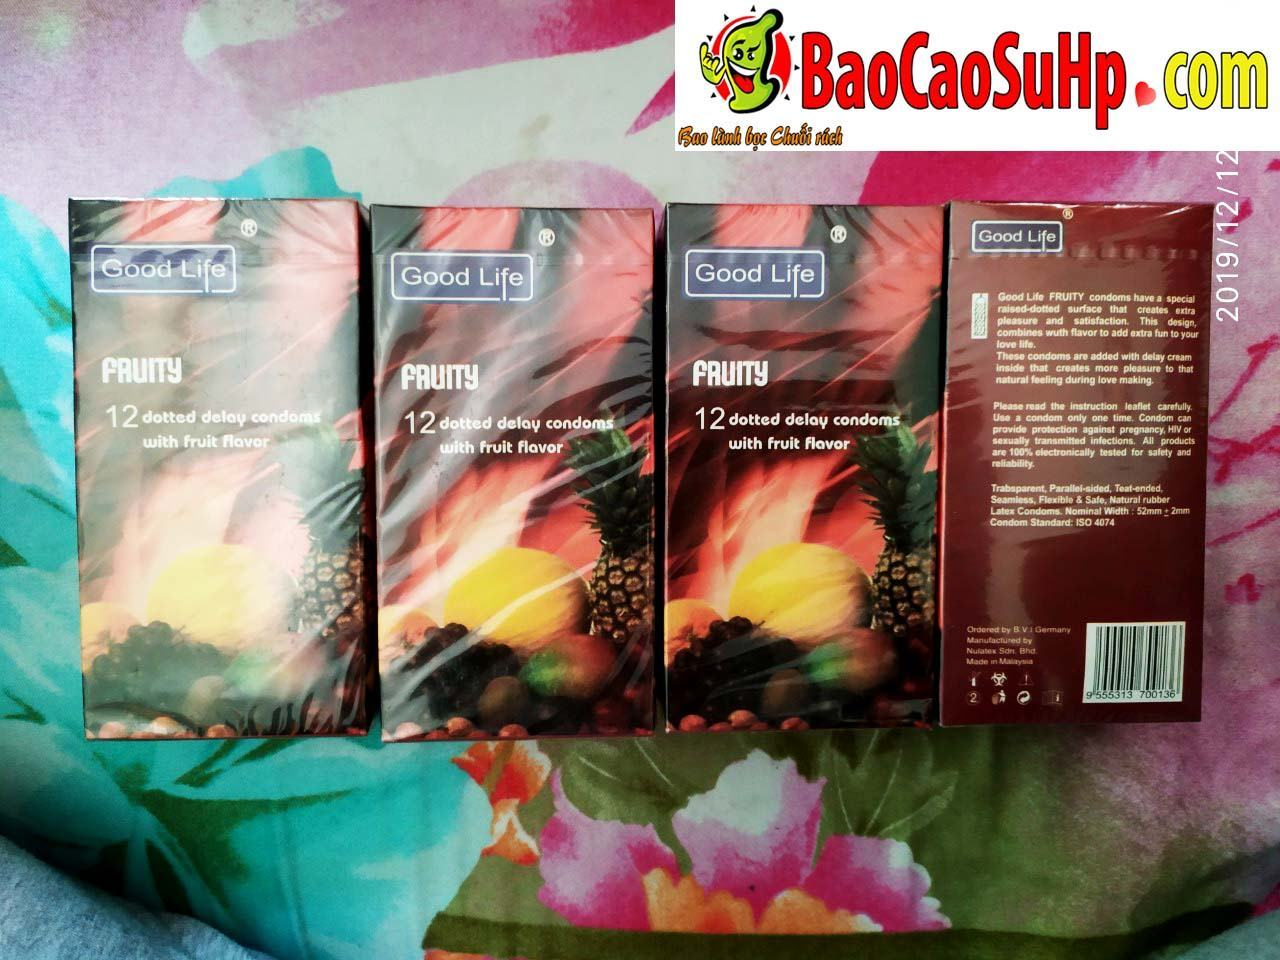 20191213092256 2475451 bao cao su good life fruity hoa qua thom mat - Bao cao su siêu mỏng kéo dài gân gai hàng về shop ngày 13.12.2019